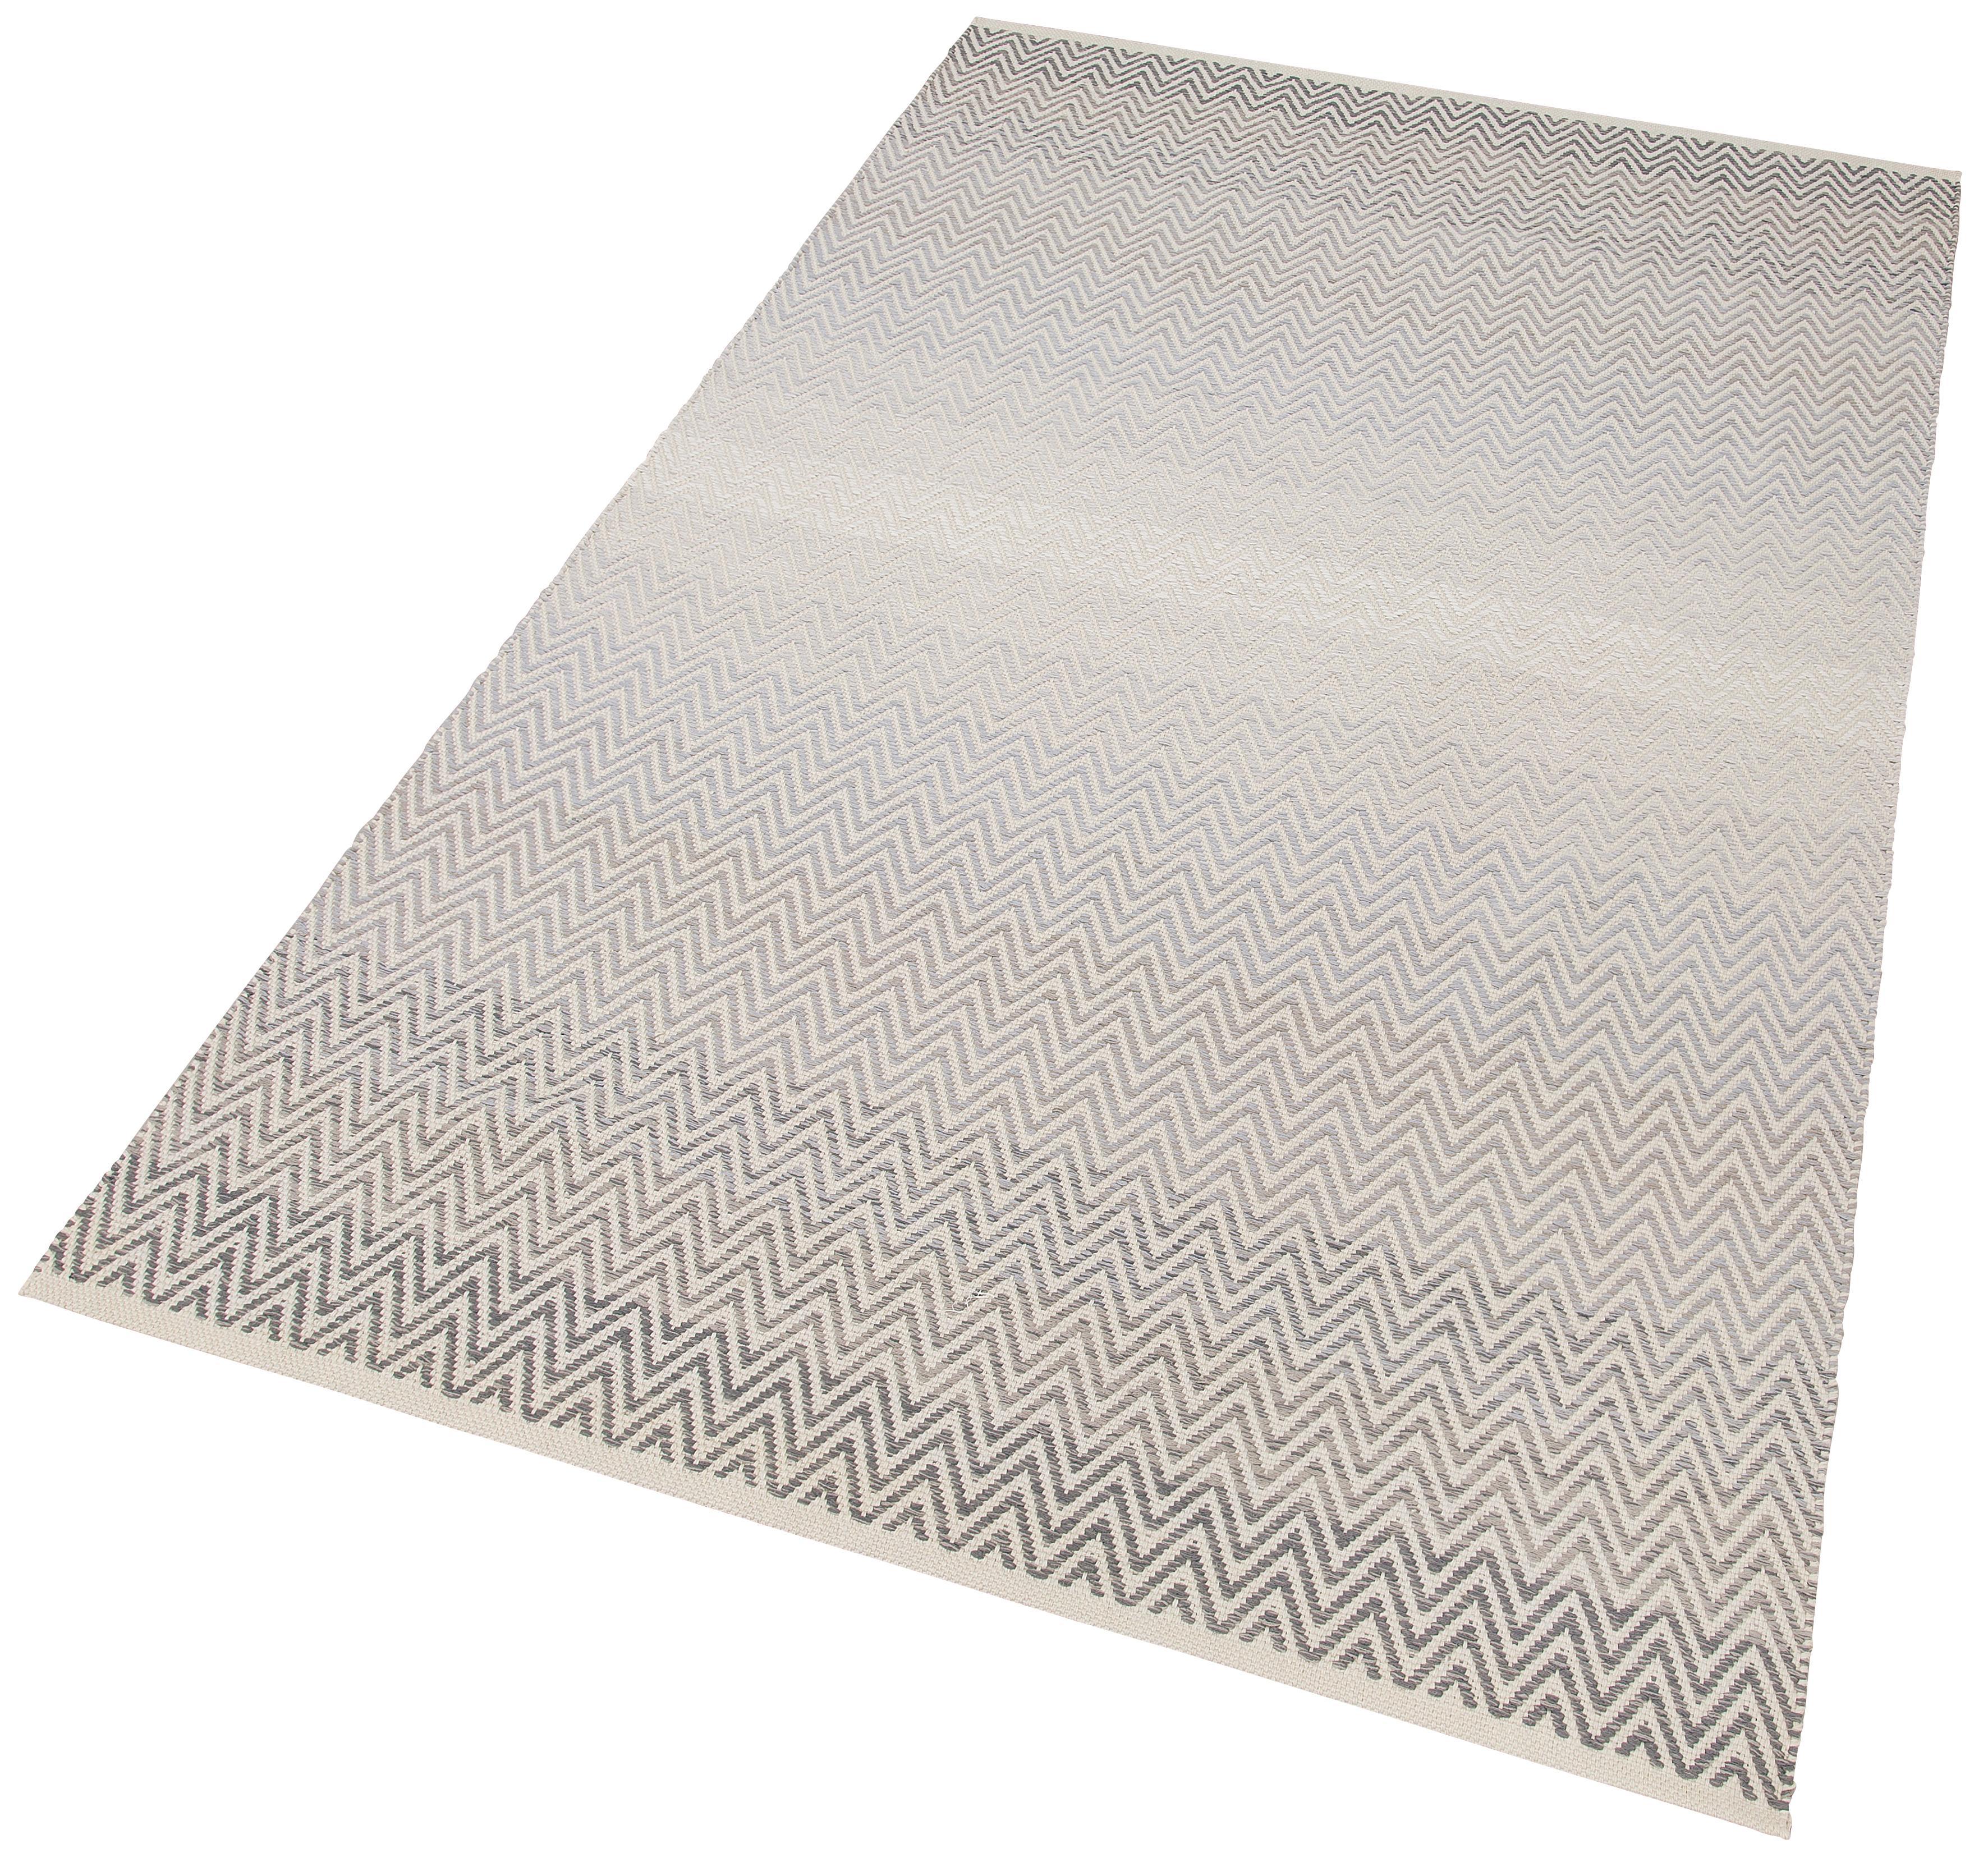 Teppich Delia Home affaire rechteckig Höhe 12 mm handgewebt